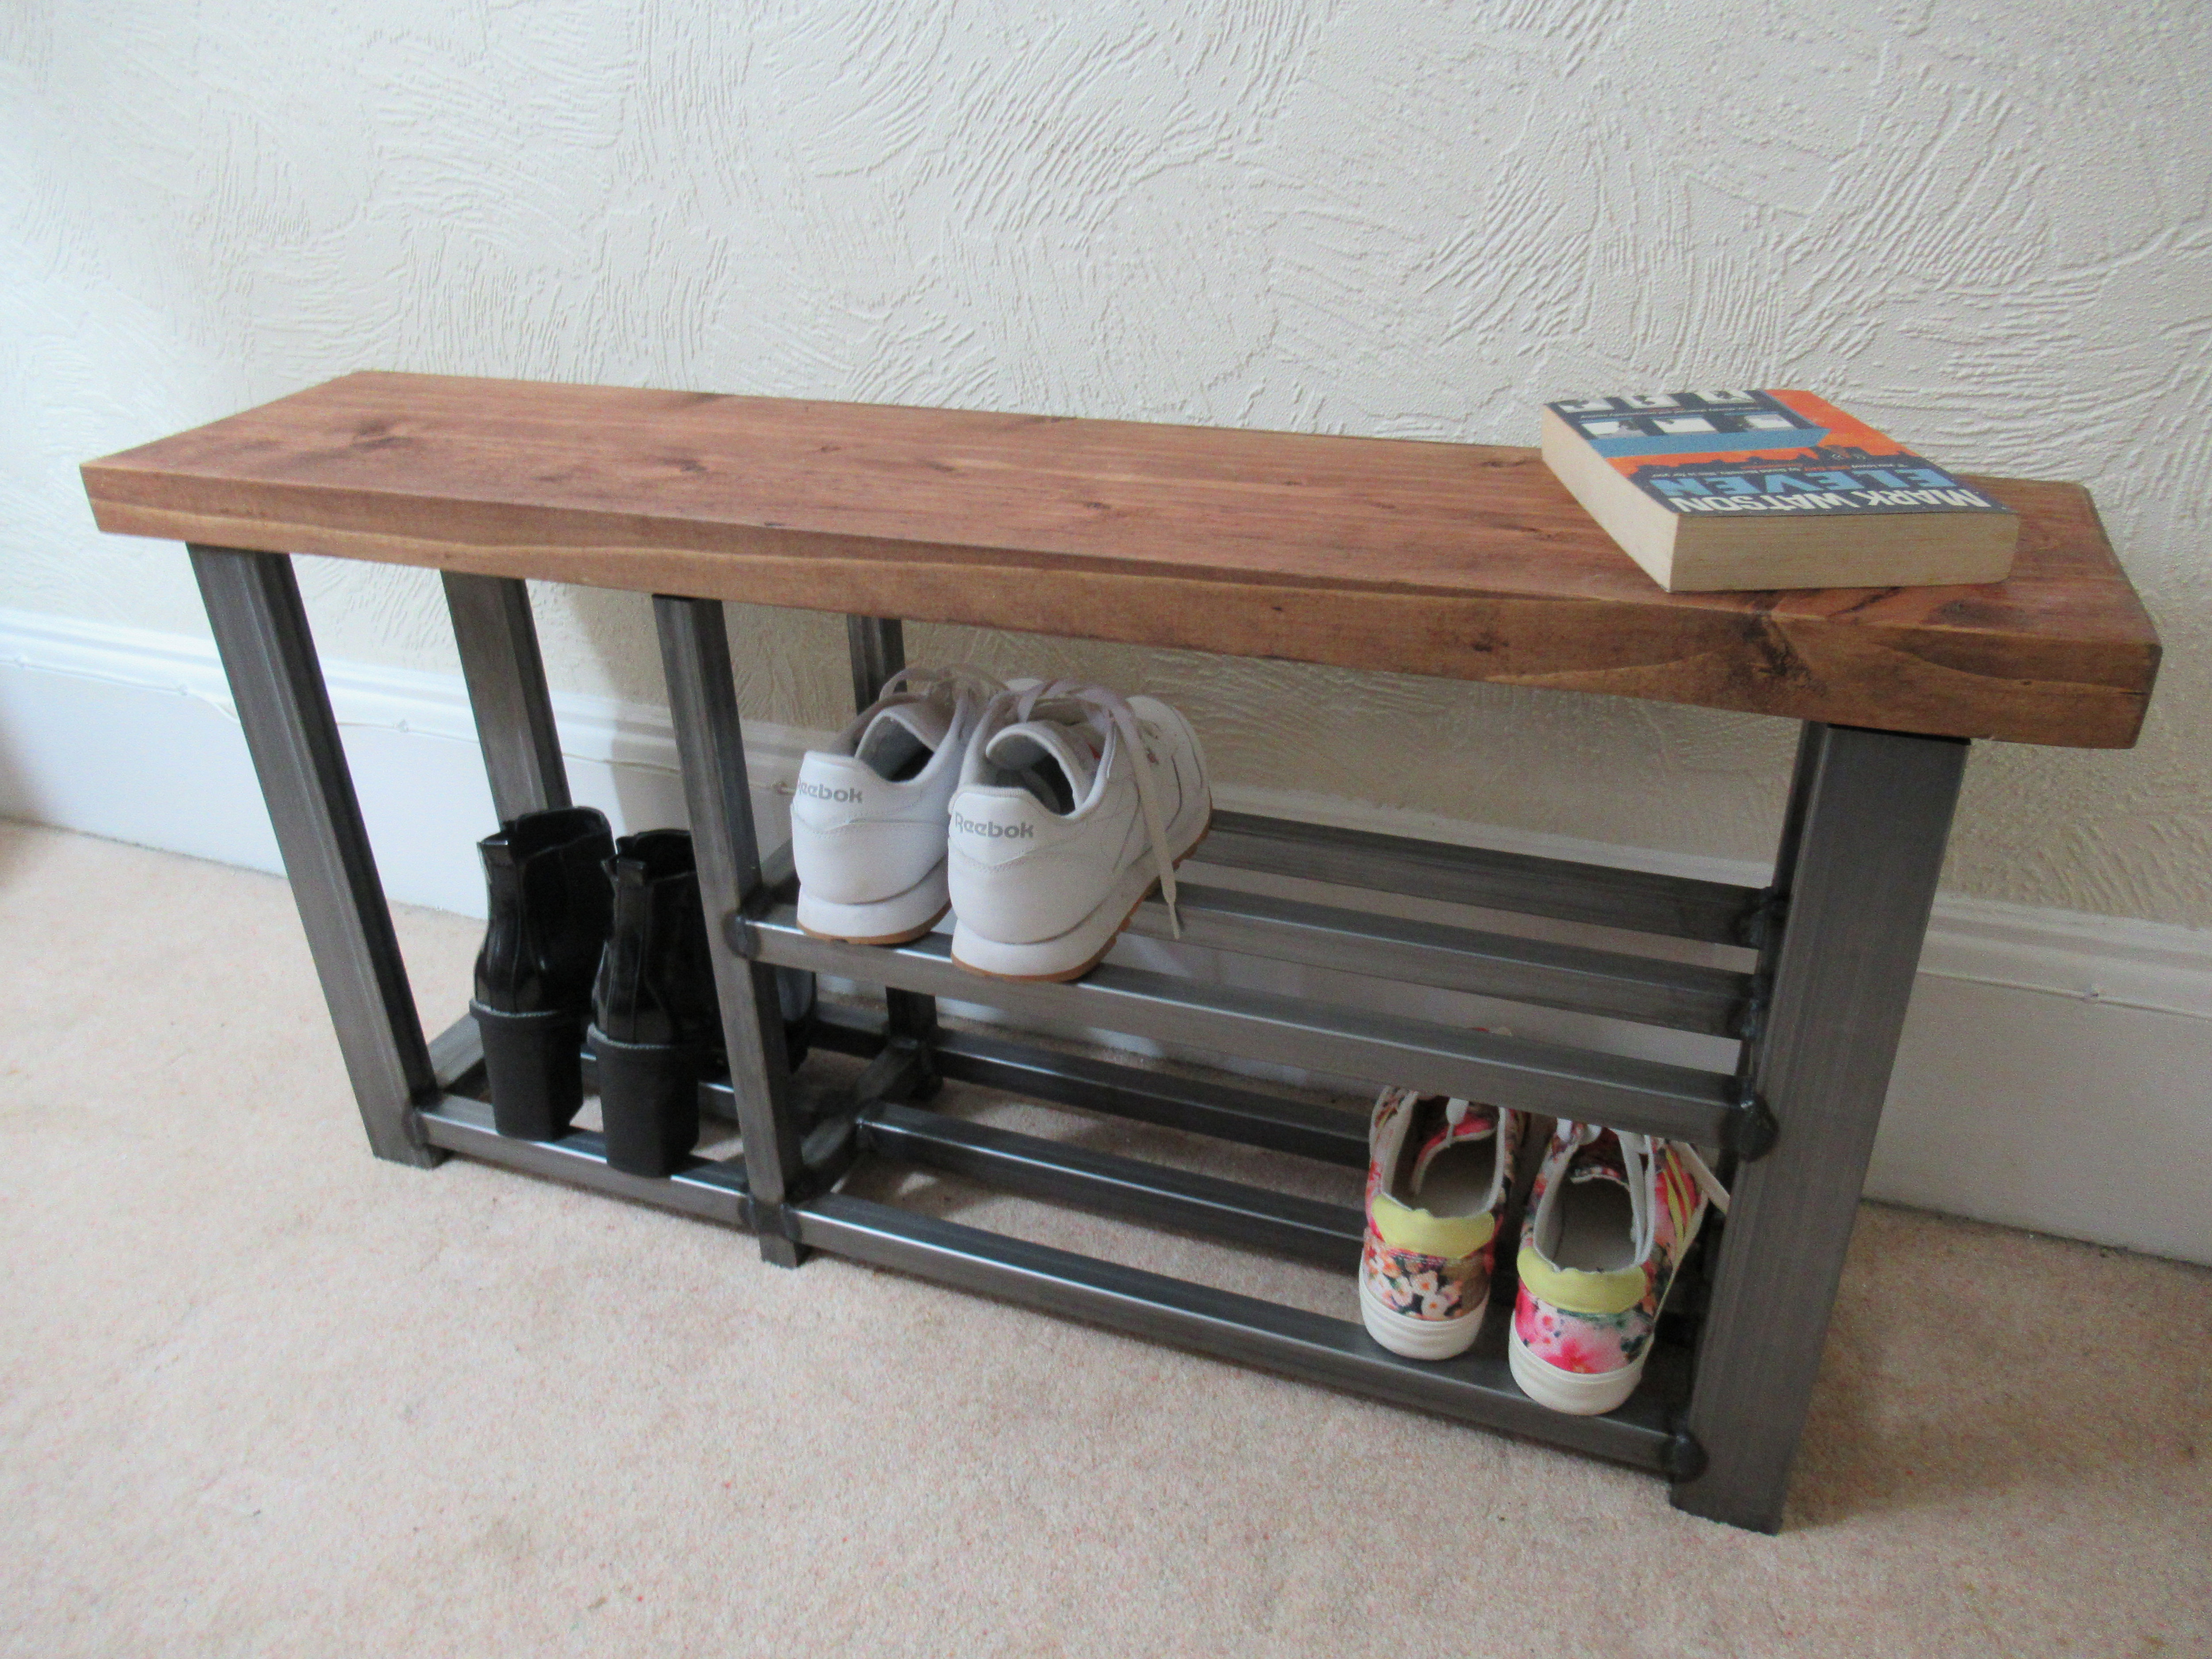 542 Shoe Welly Boot Rack Two Shelf Hallway Bench Seat